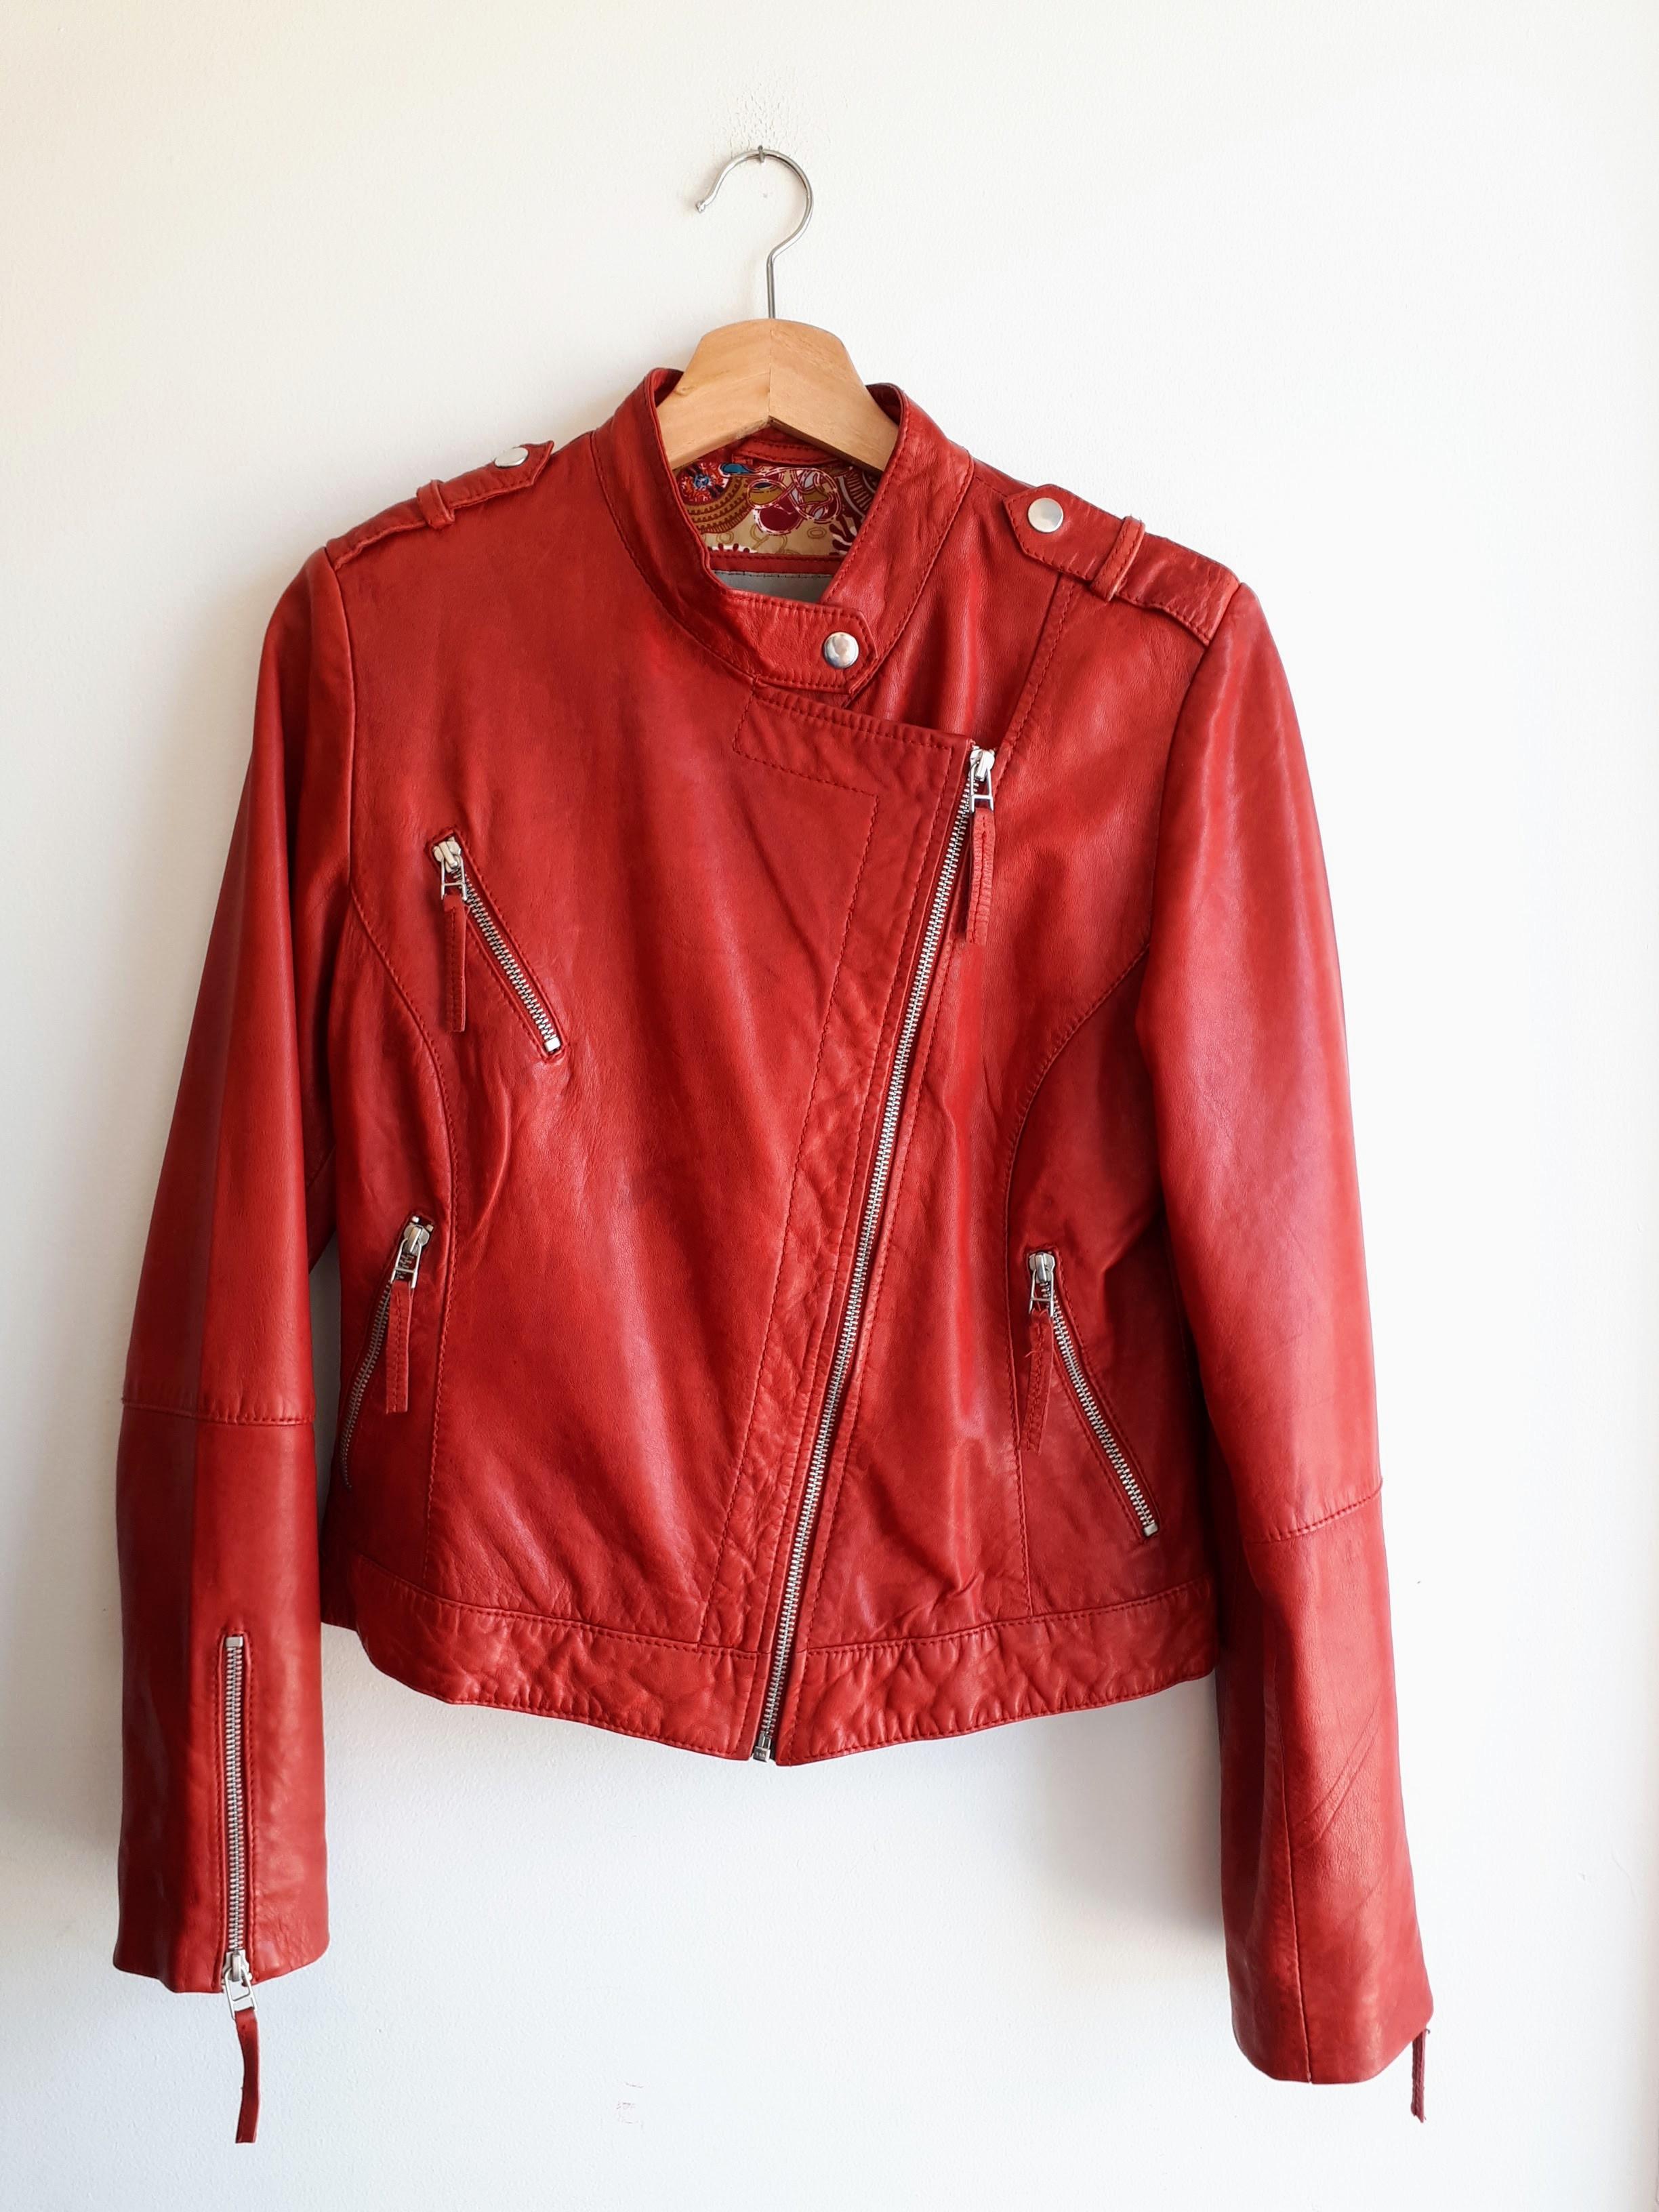 Bod and Christensen jackets; Size M, $64